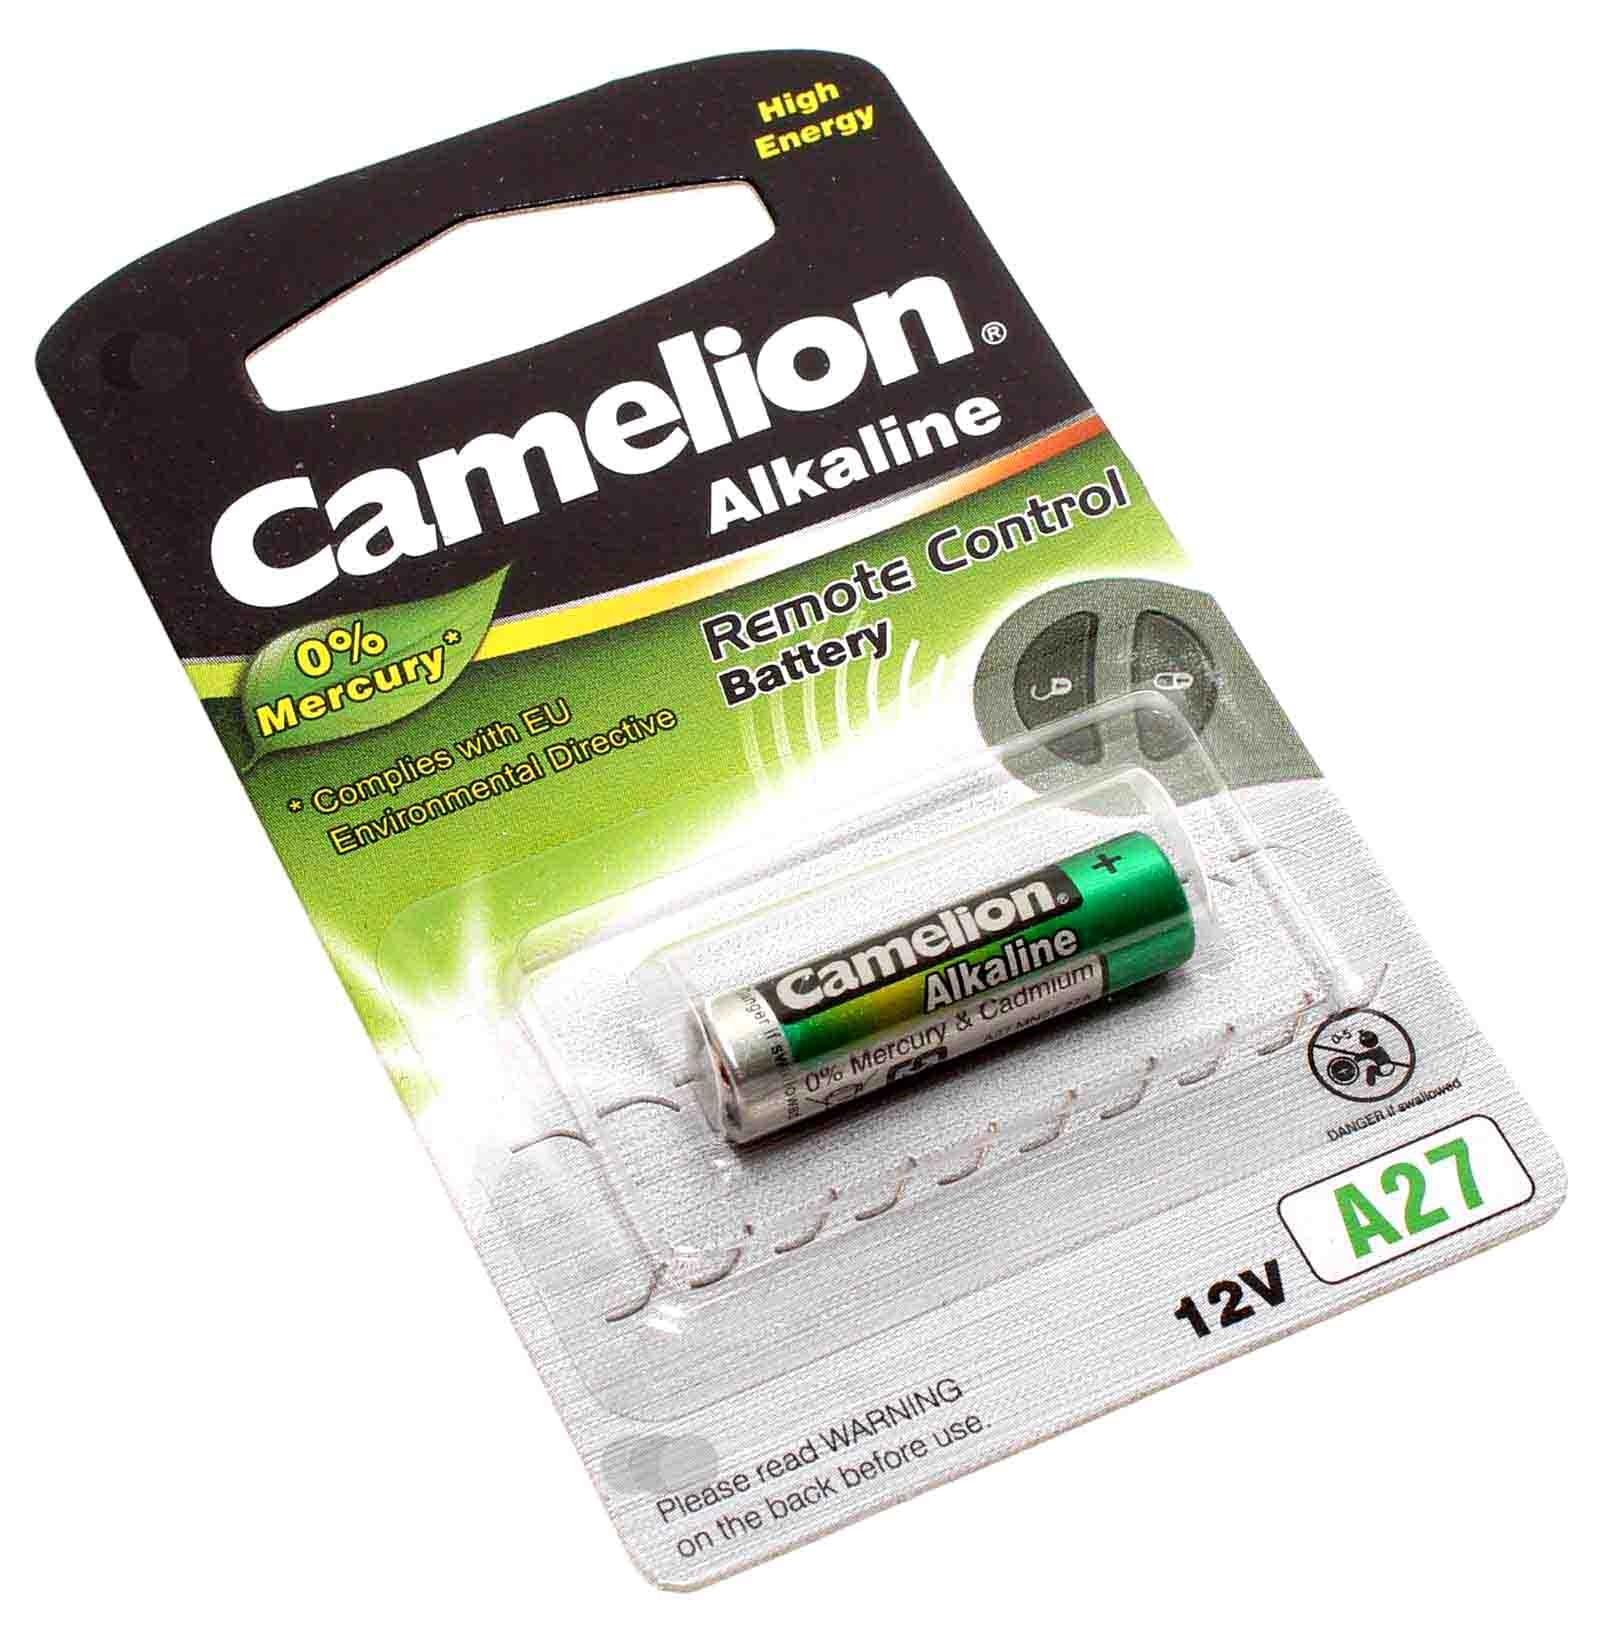 12V Camelion A27 Alkaline Remote Control Fernbedienung Batterie, 26mAh, wie LR27A, G27A, MN27, GP27A